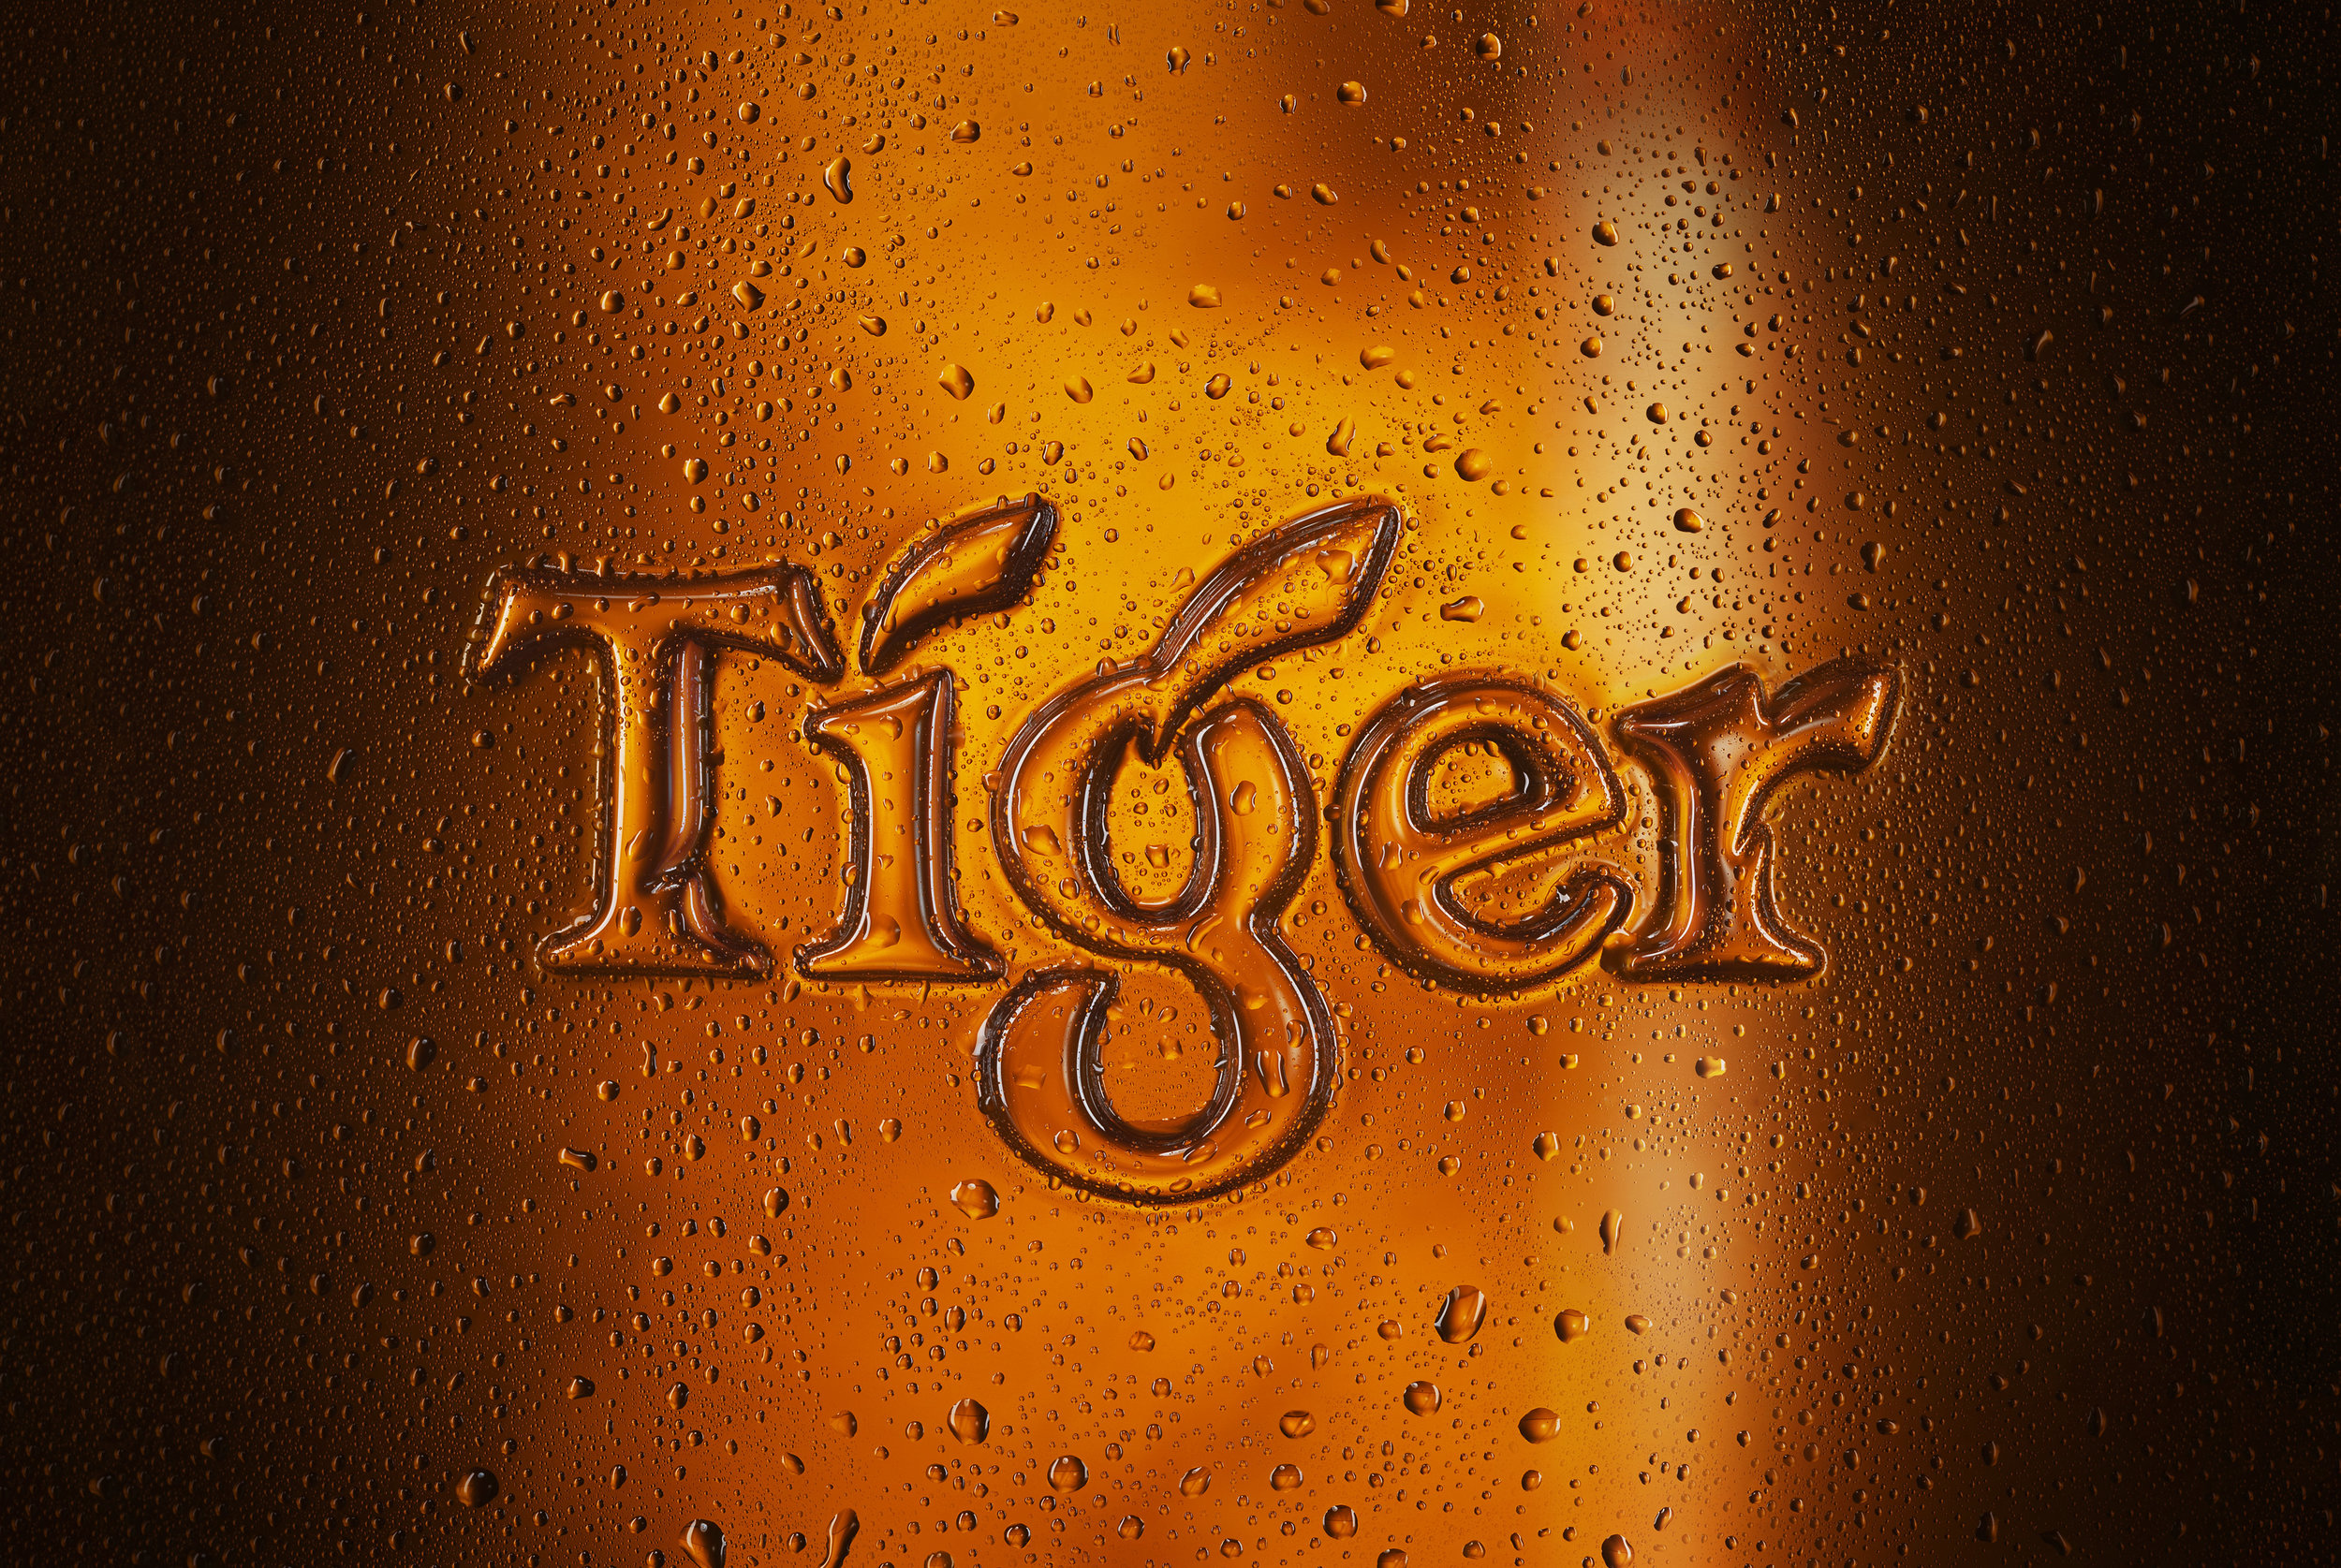 TIGER_CORE_TOP_02.jpg